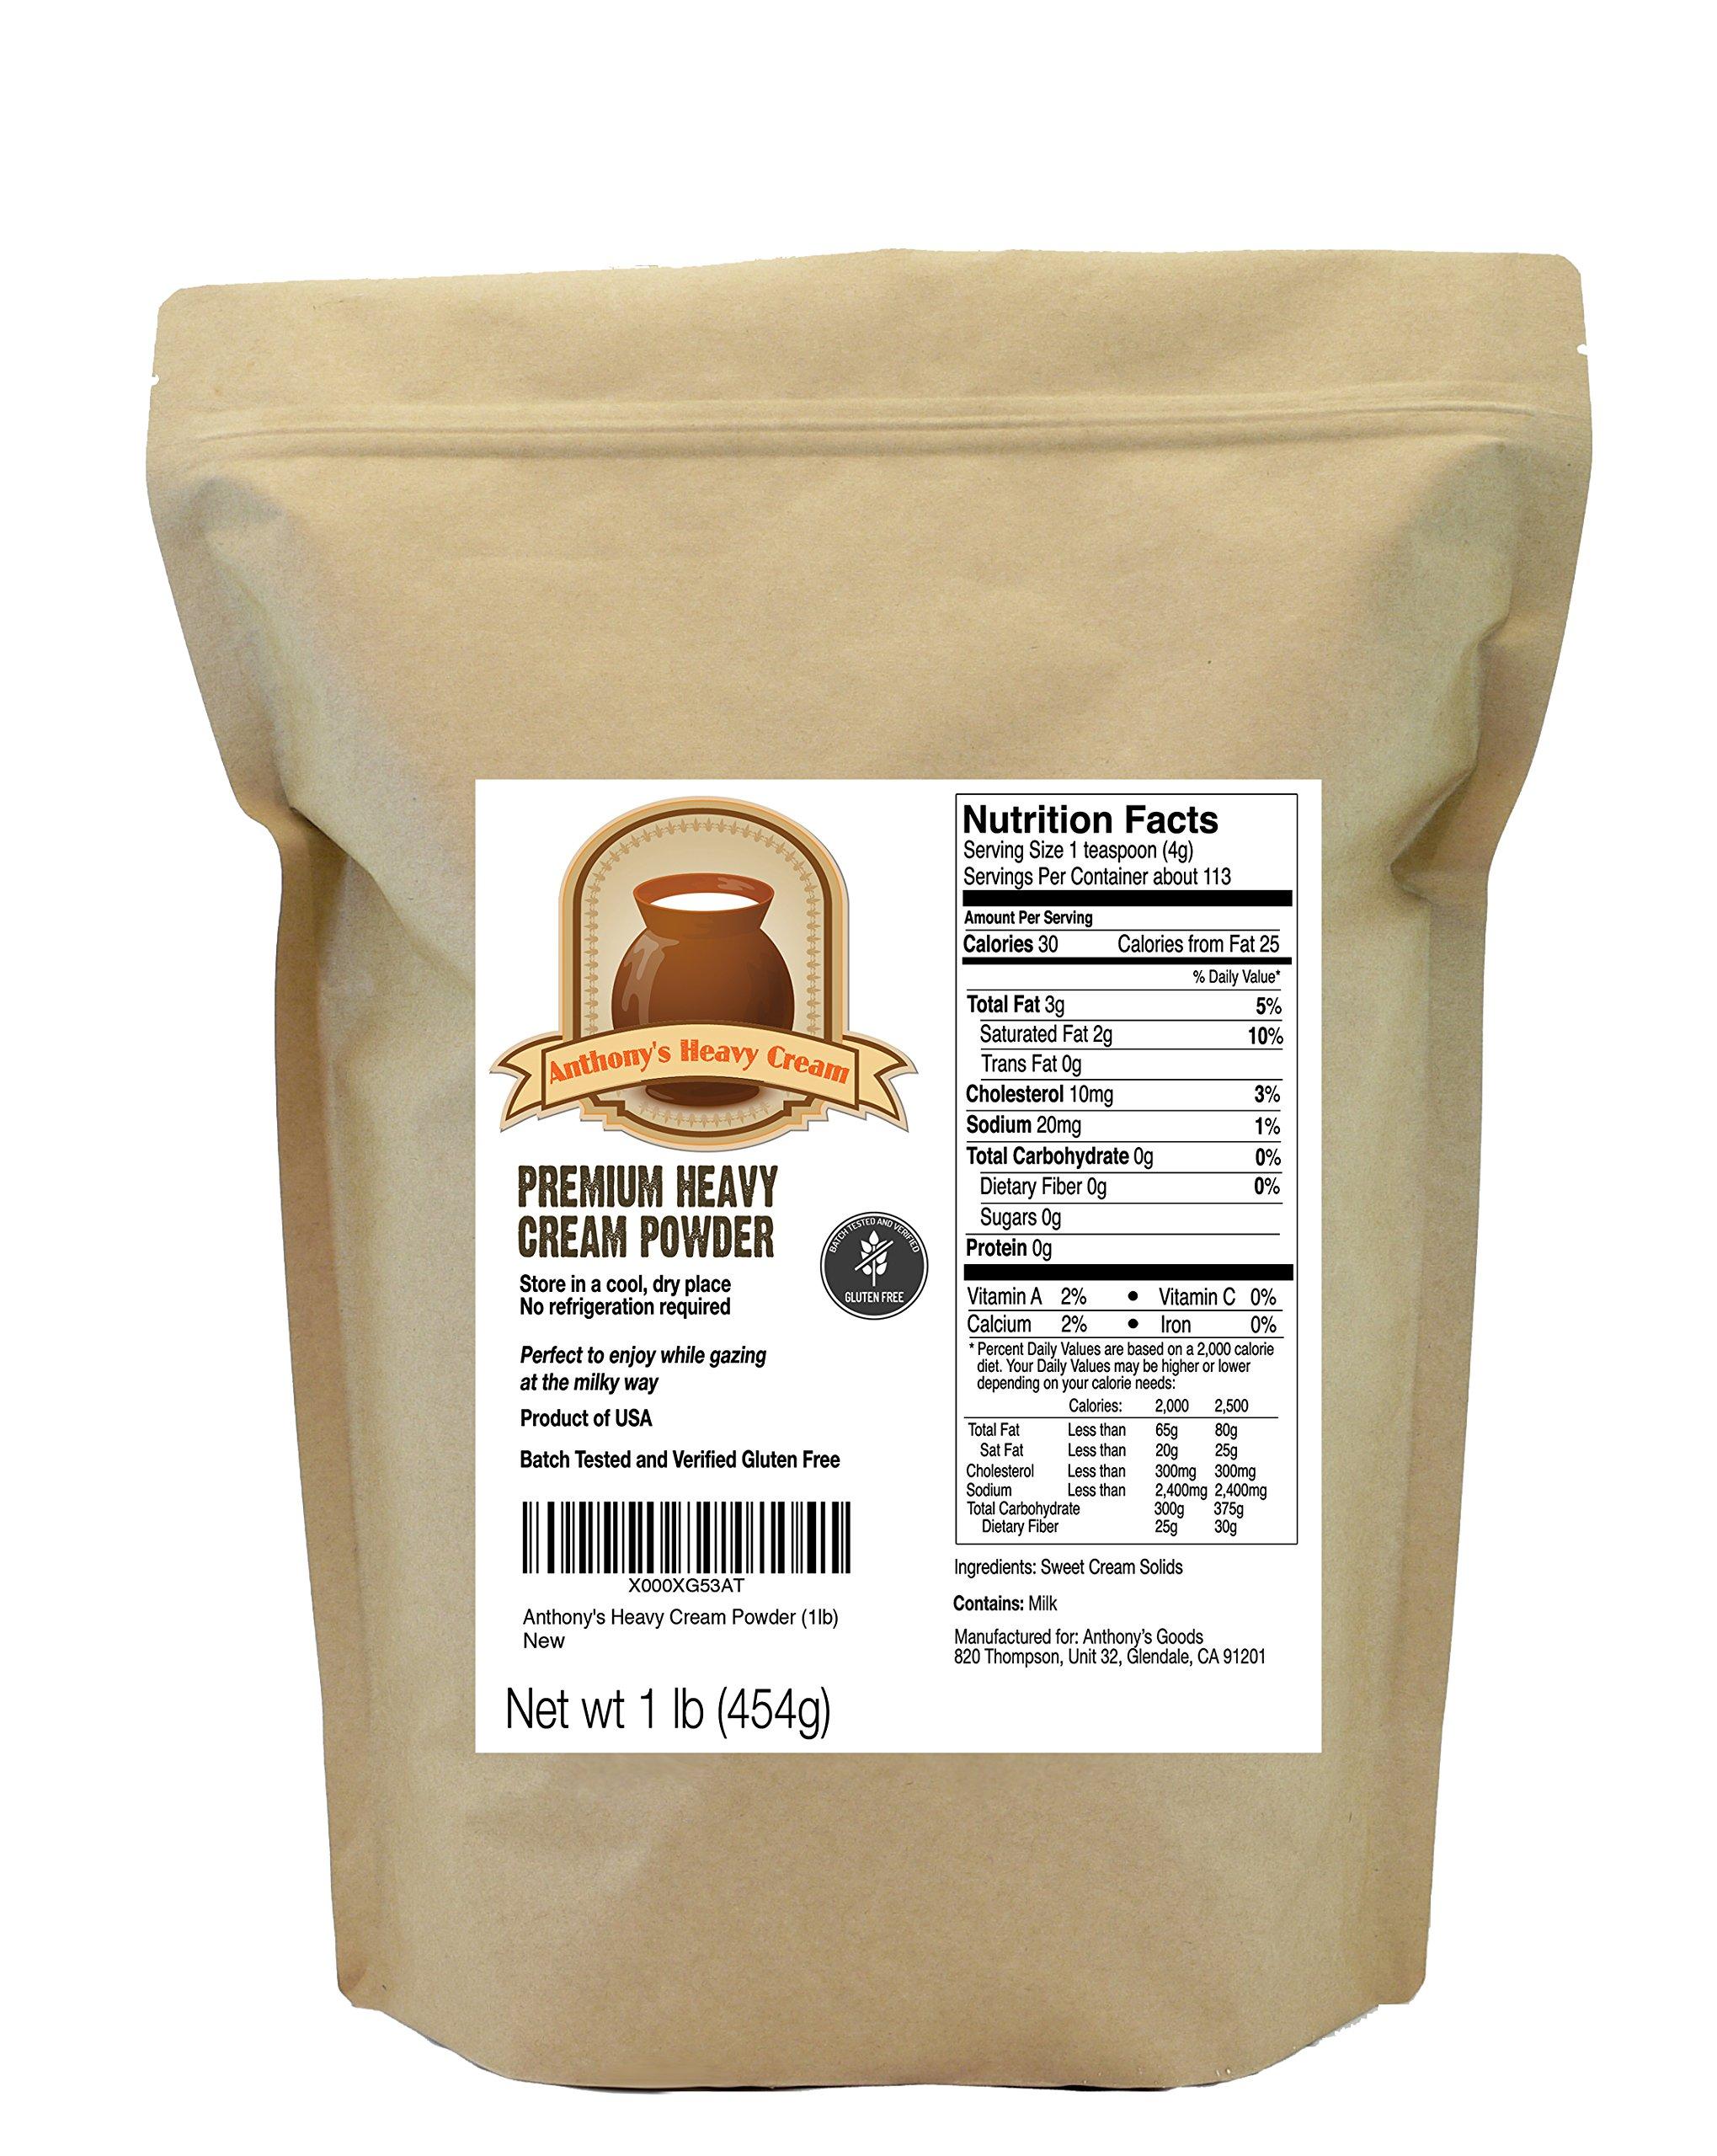 Heavy Cream Powder (1lb) by Anthony's, Batch Tested Gluten-Free